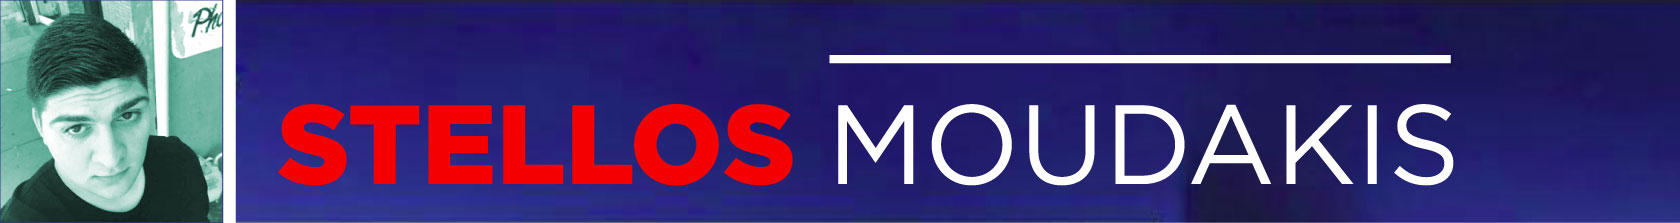 Stellos Moudakis